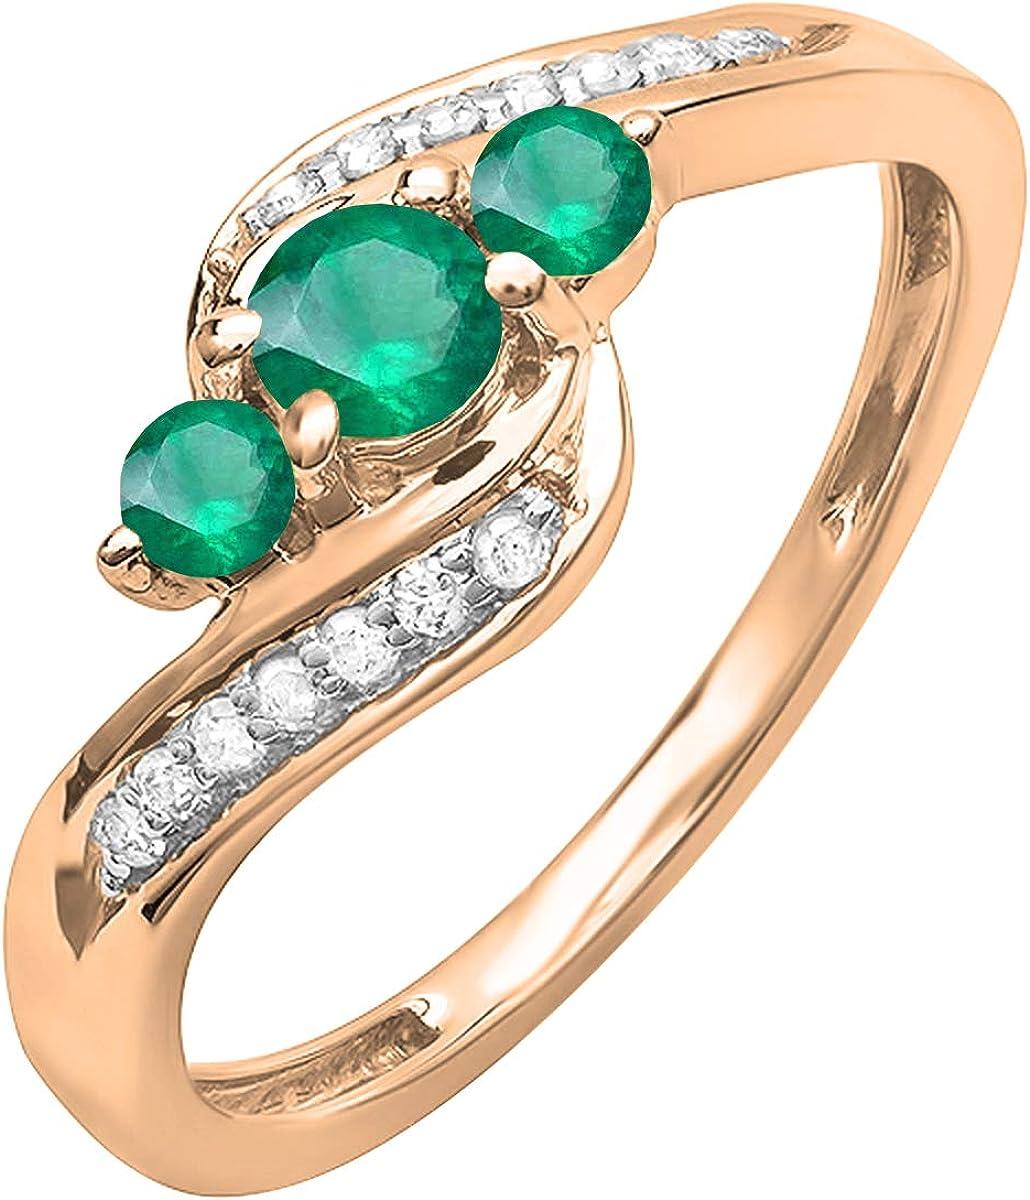 Dazzlingrock Collection 14K Gold Round Emerald & White Diamond Ladies 3 Stone Swirl Engagement Ring